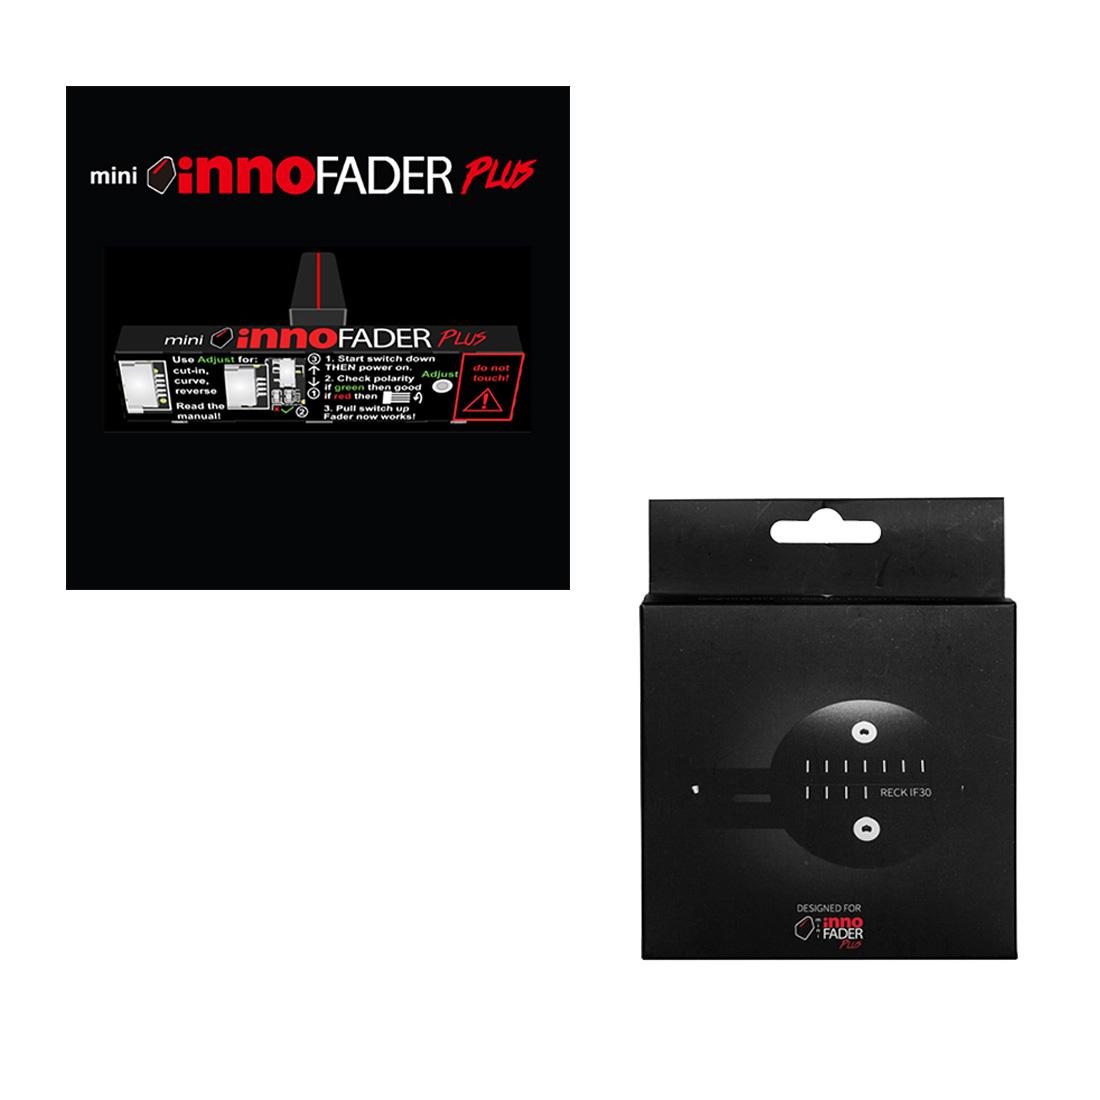 mini innofader PLUS + PT01 Scratch 専用マウントセット!( RECK-IF30 / カスタムパーツ)【送料無料】